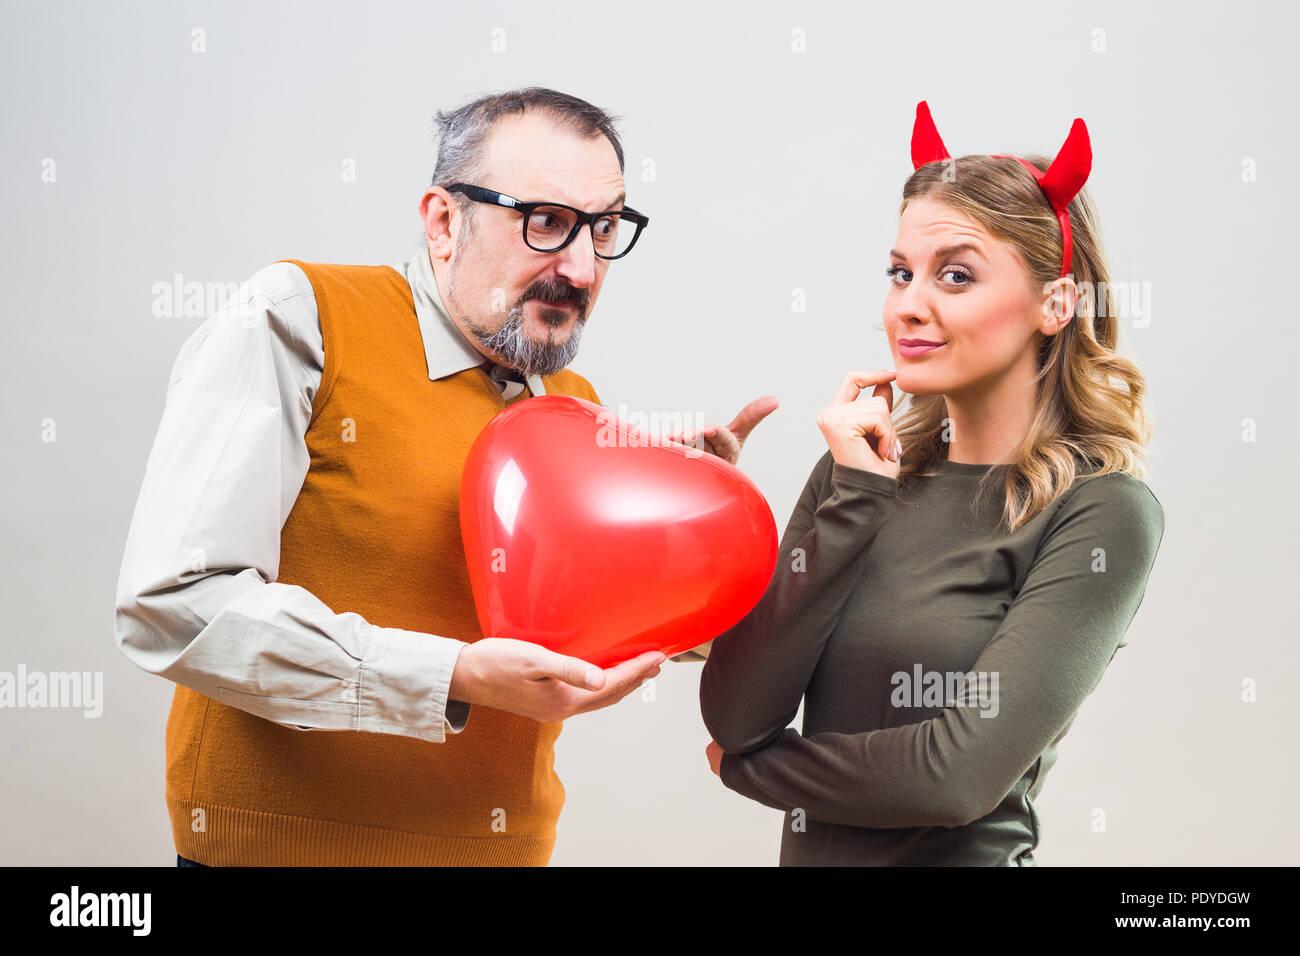 Nerdy man is uncertain in his girlfriend love. Stock Photo